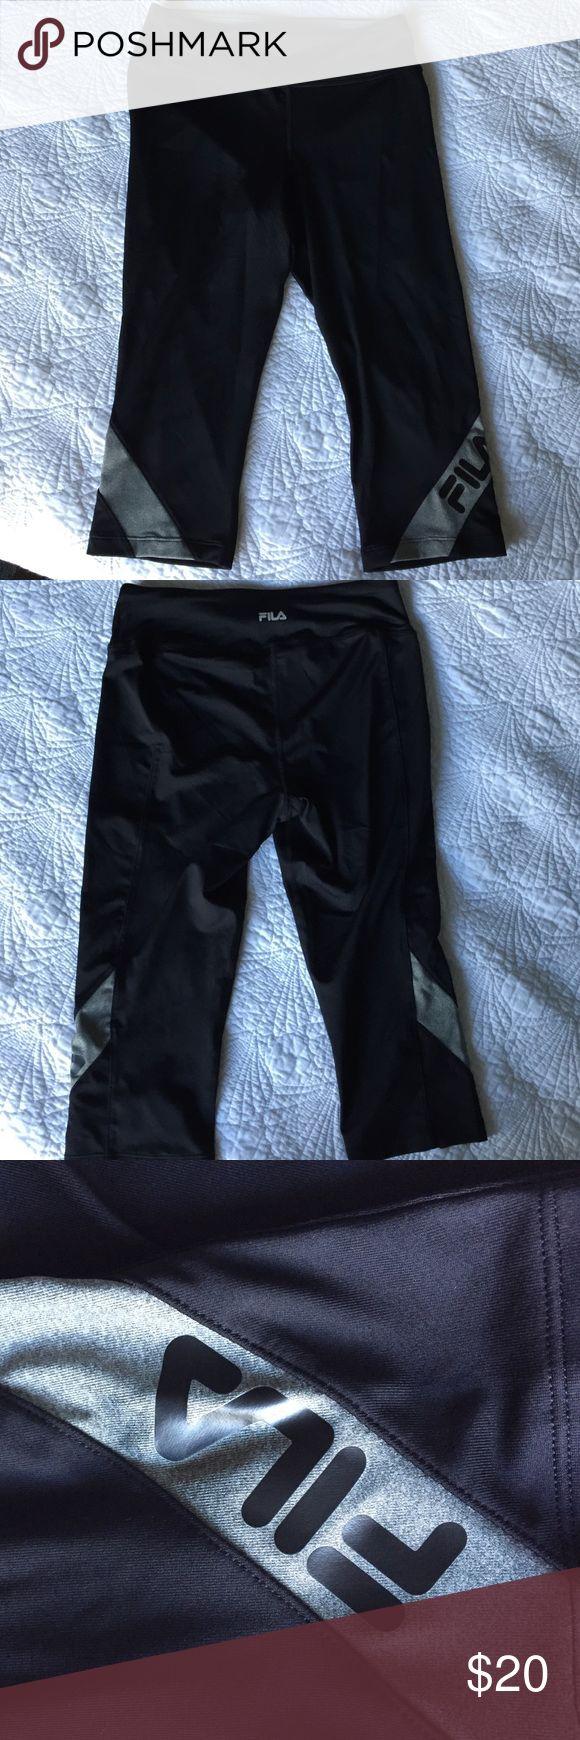 FILA Black and Gray Athletic Pants, Size Small FILA Black and Gray Athletic Pants, Size Small. 88% Polyester, 12% Spandex. Like new. Fila Pants